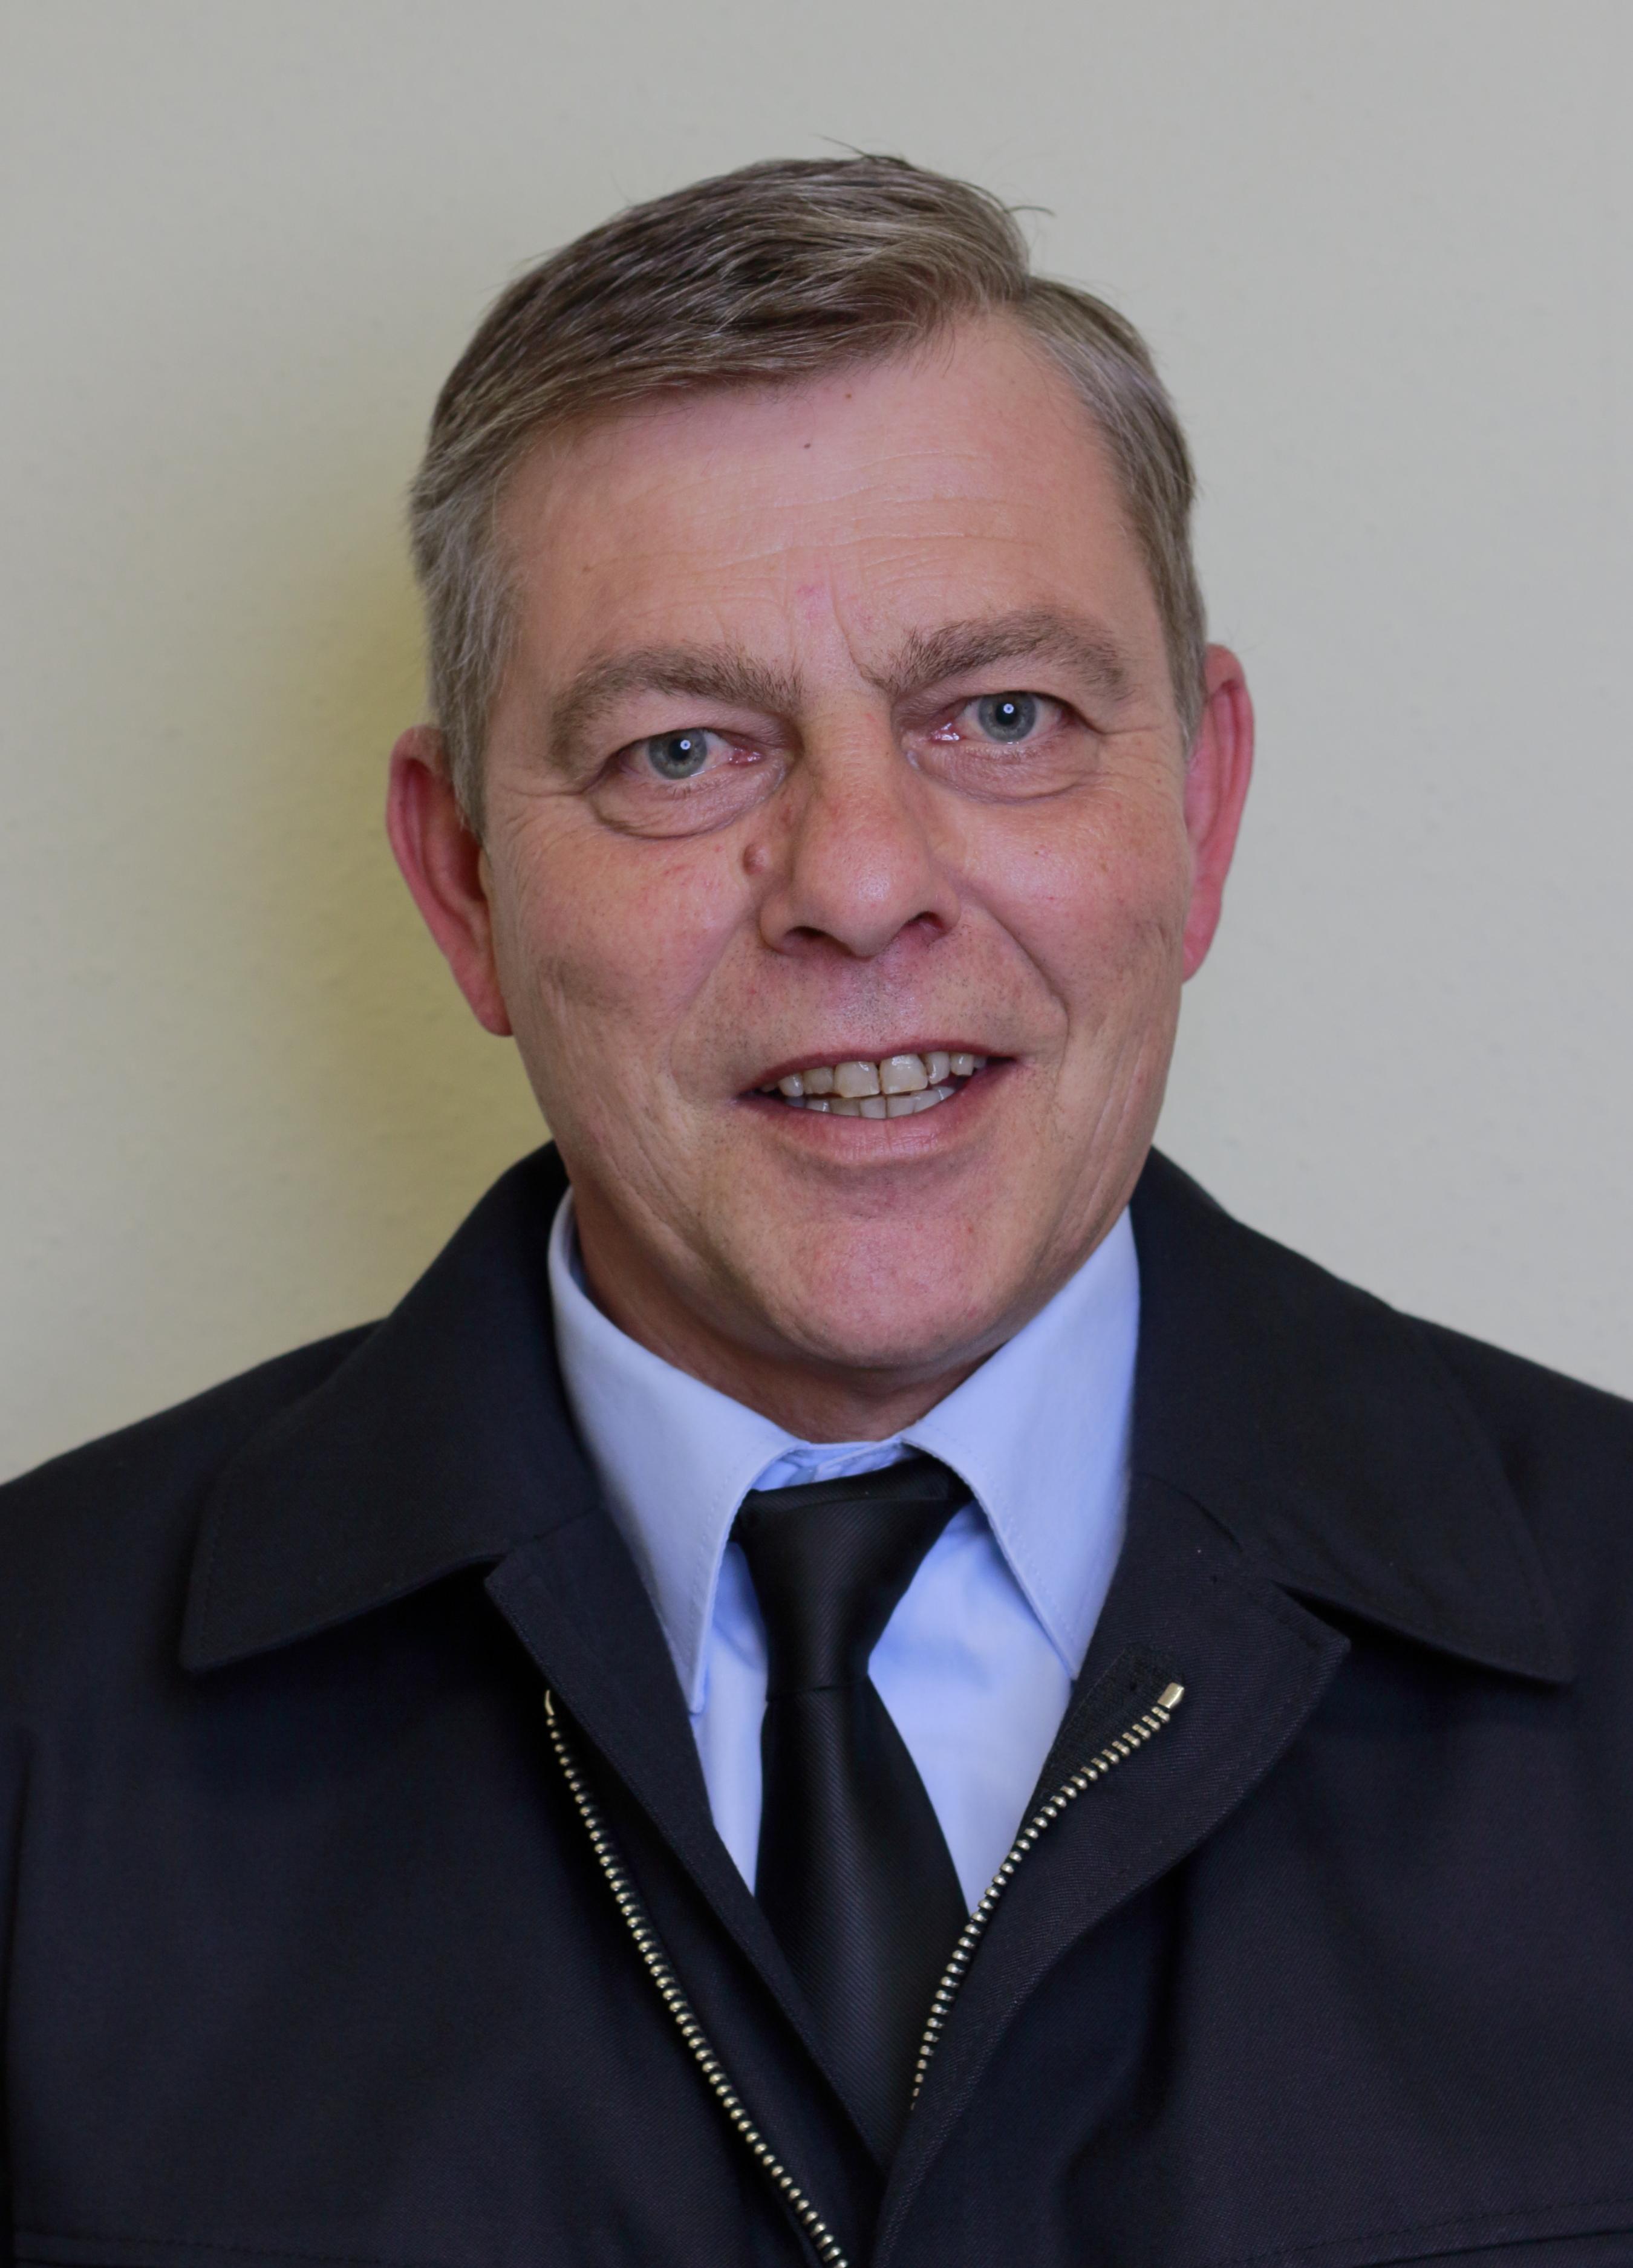 Stefan Hohley